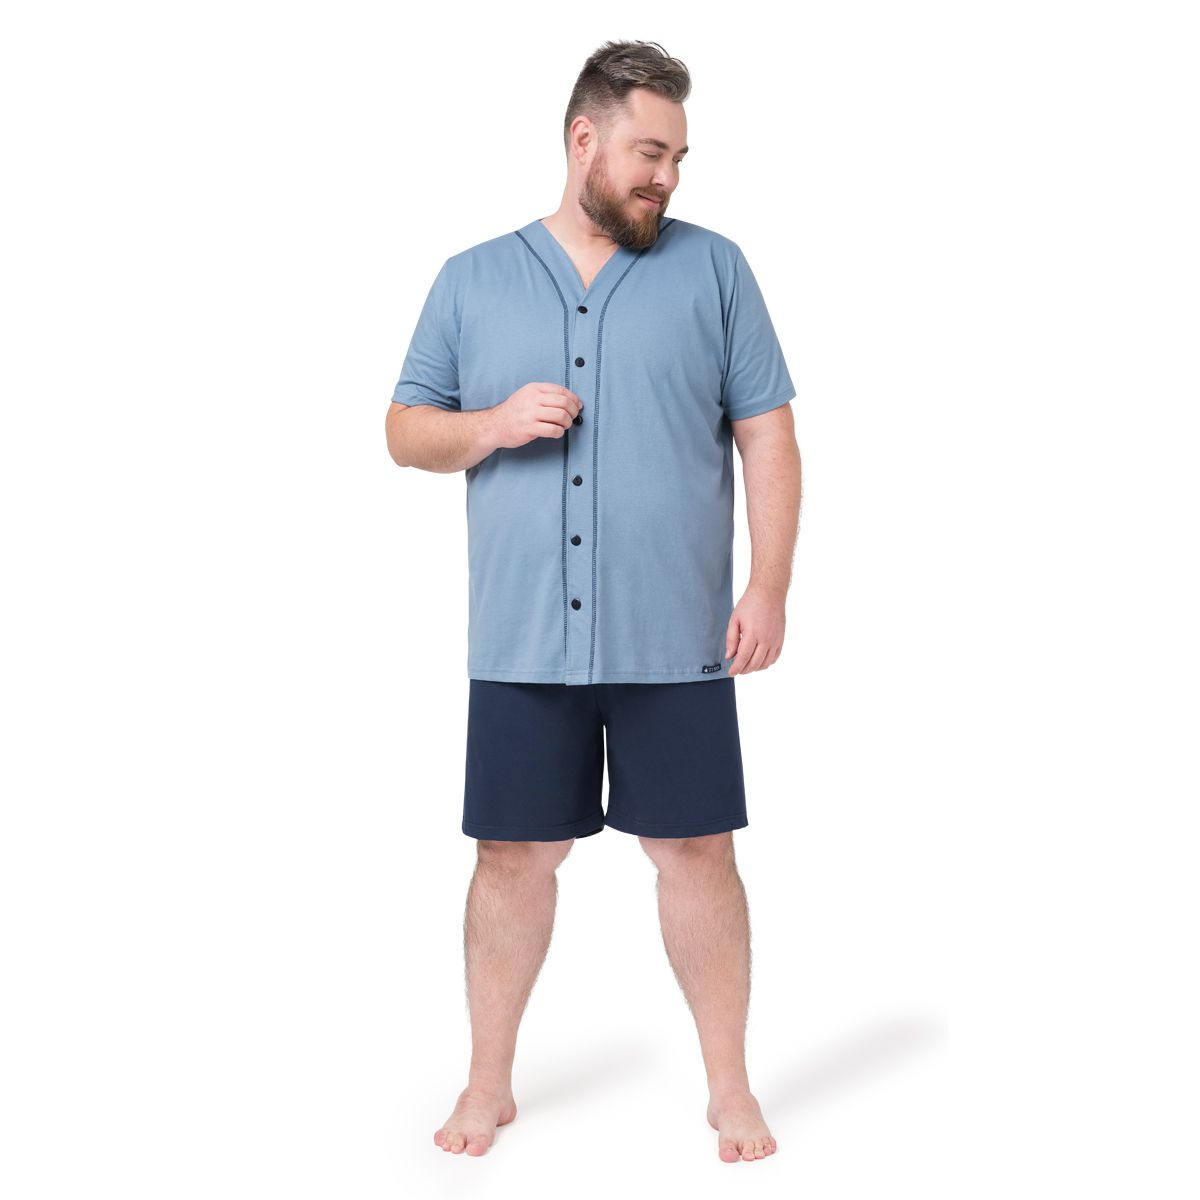 Pijama Masculino Curto Aberto Tamanhos Especiais Plus Size 05.02.013